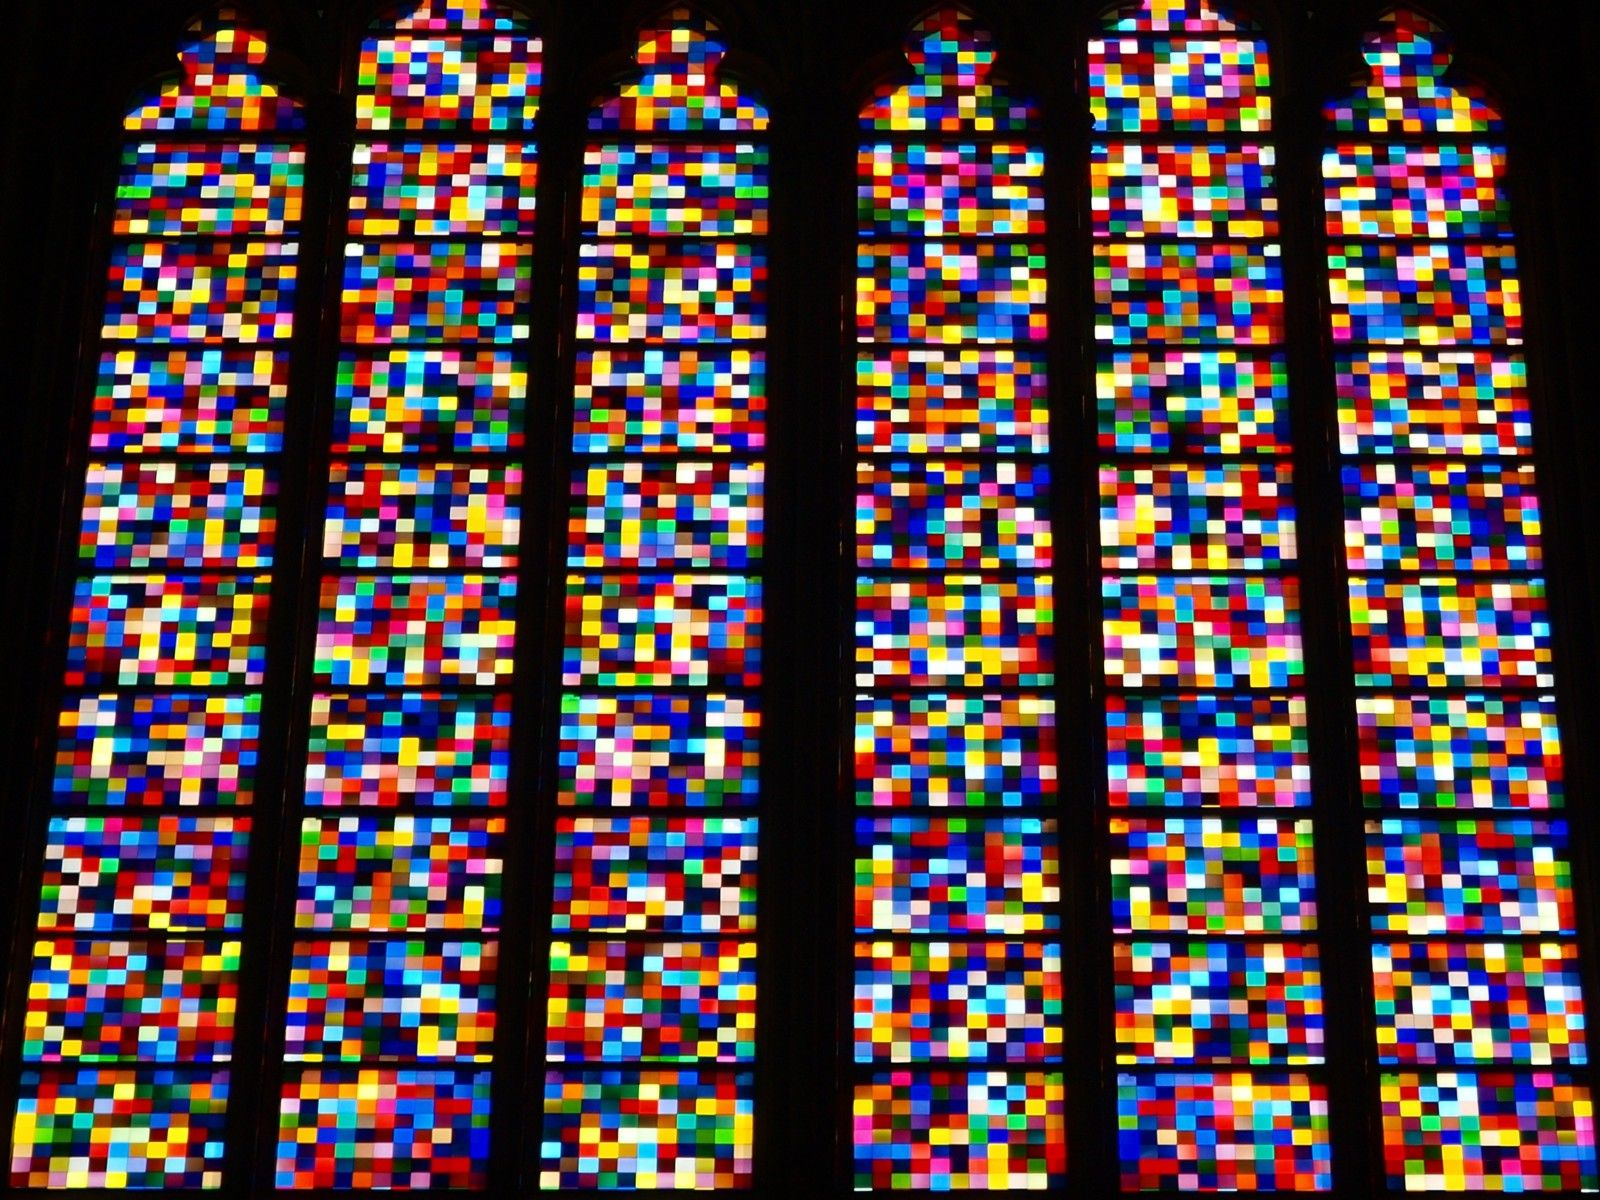 Gerhard Richter Kolner Domfenster Cologne Cathedral Window 2007 11 000 Hand Blown Glass Panels 7 Church Windows Gerhard Richter Gerhard Richter Abstract